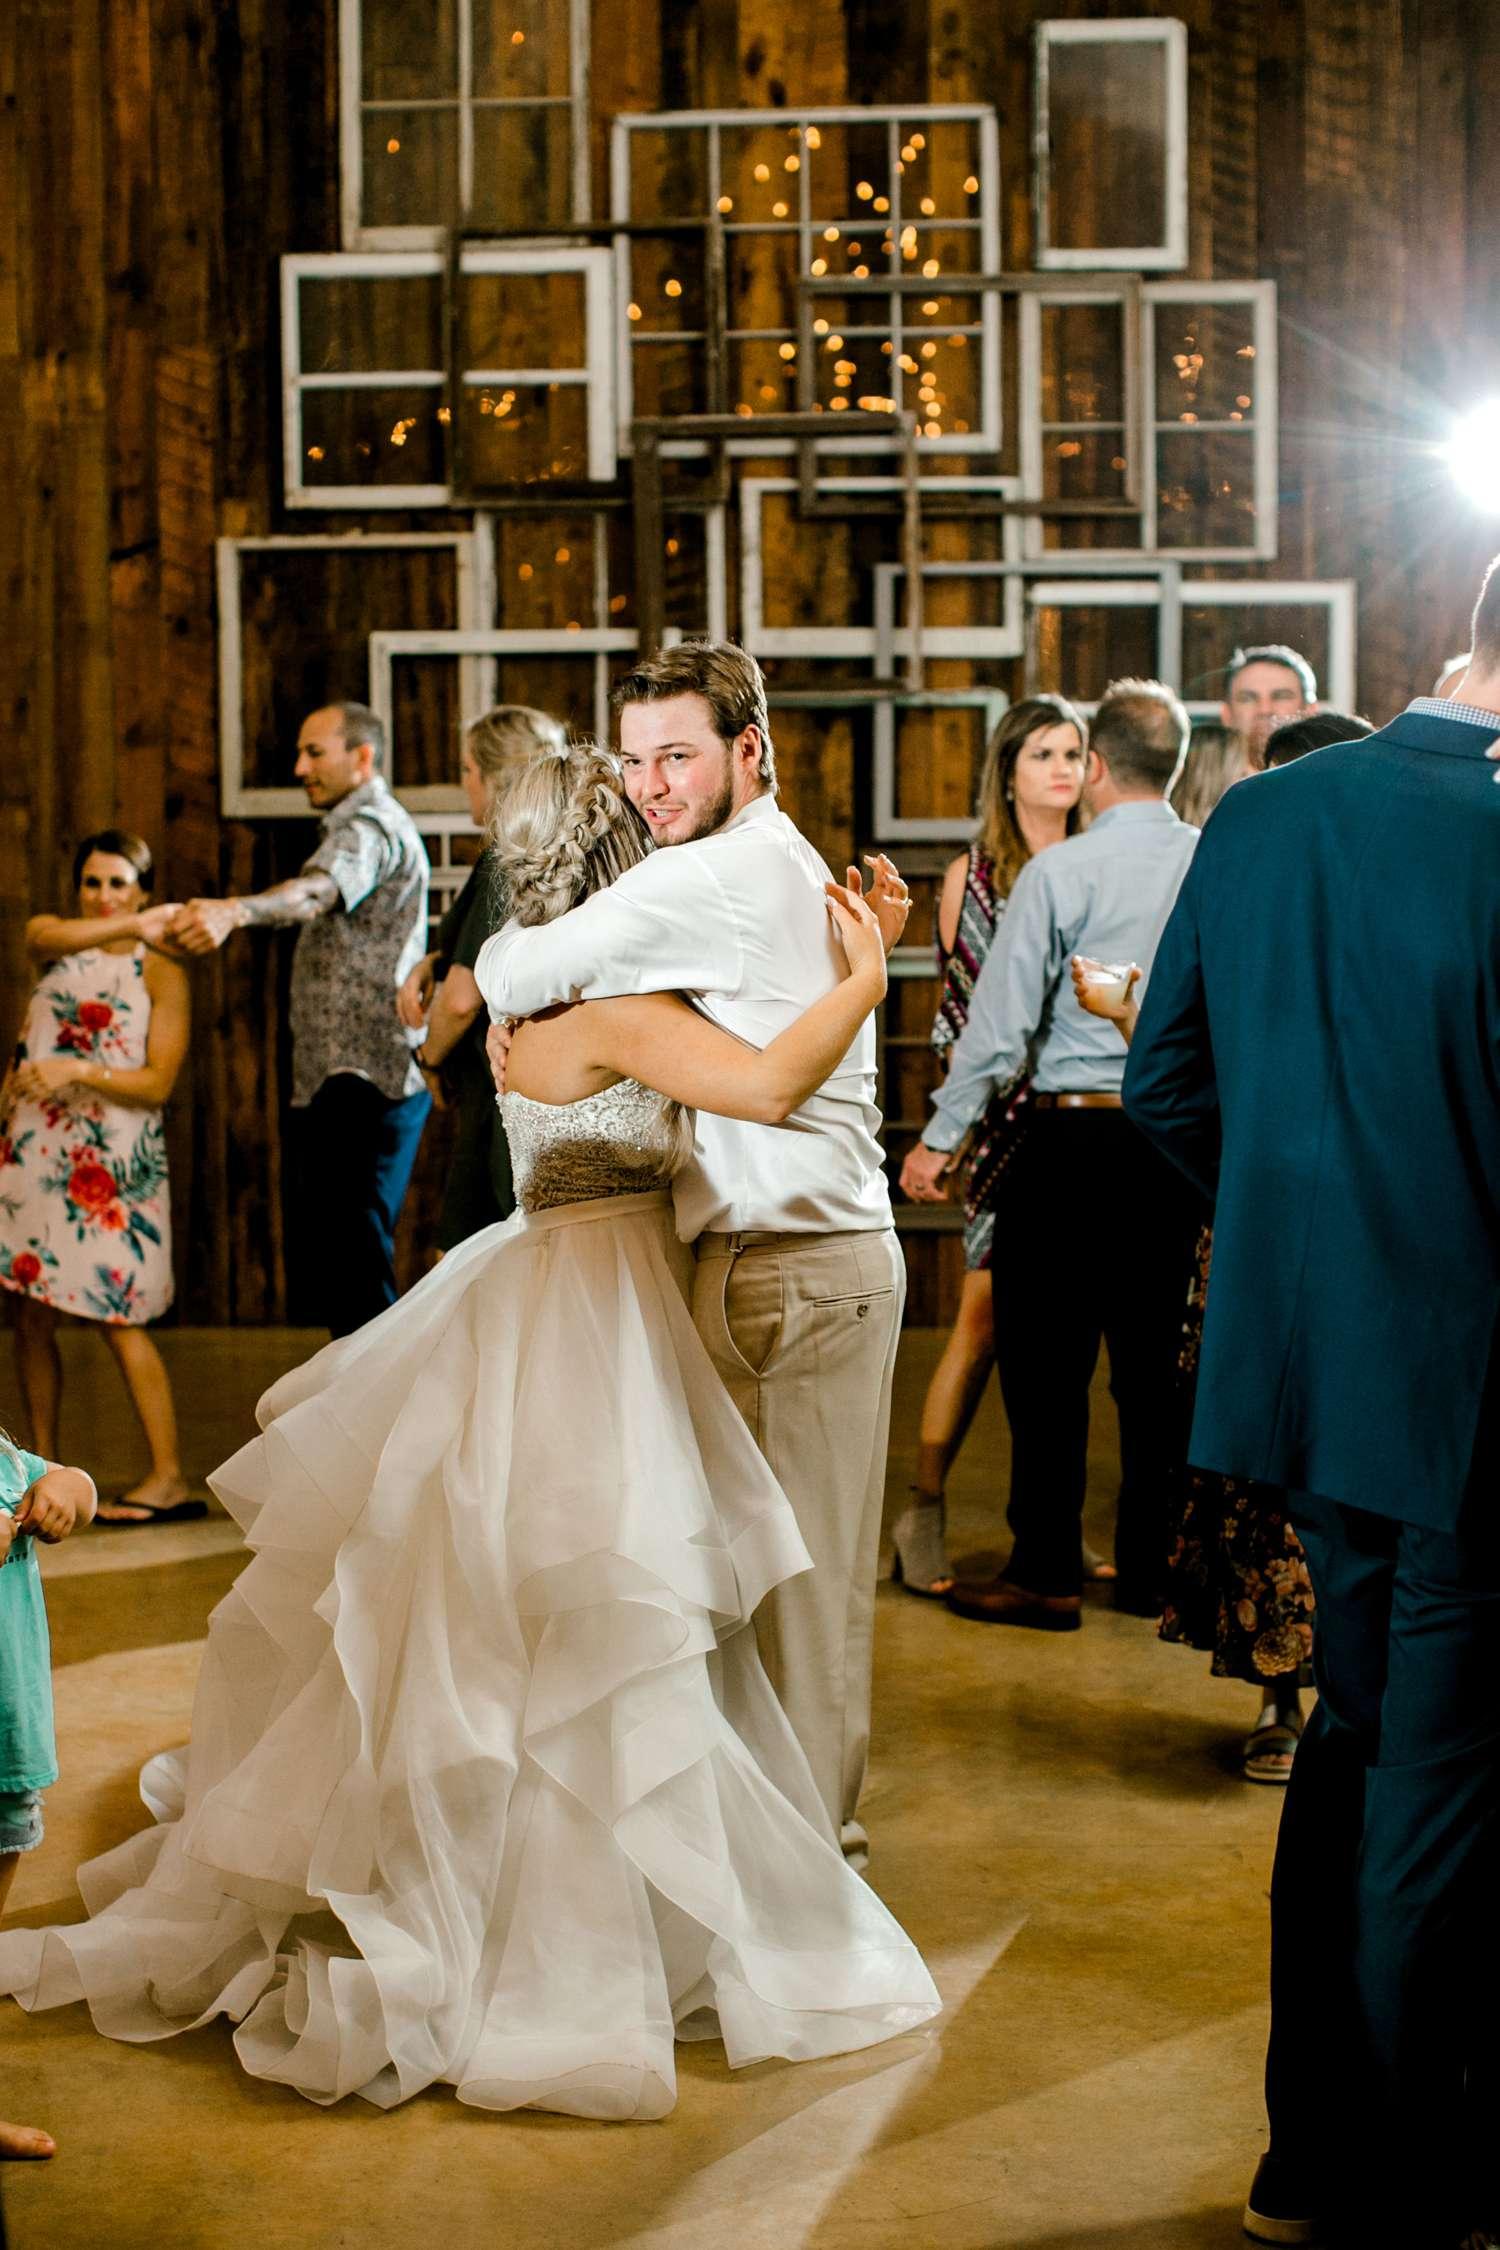 HAYLEE+JUSTIN+GREGORY+HERITAGE_HAUS_AUSTIN_TEXAS_WEDDING_0200.jpg